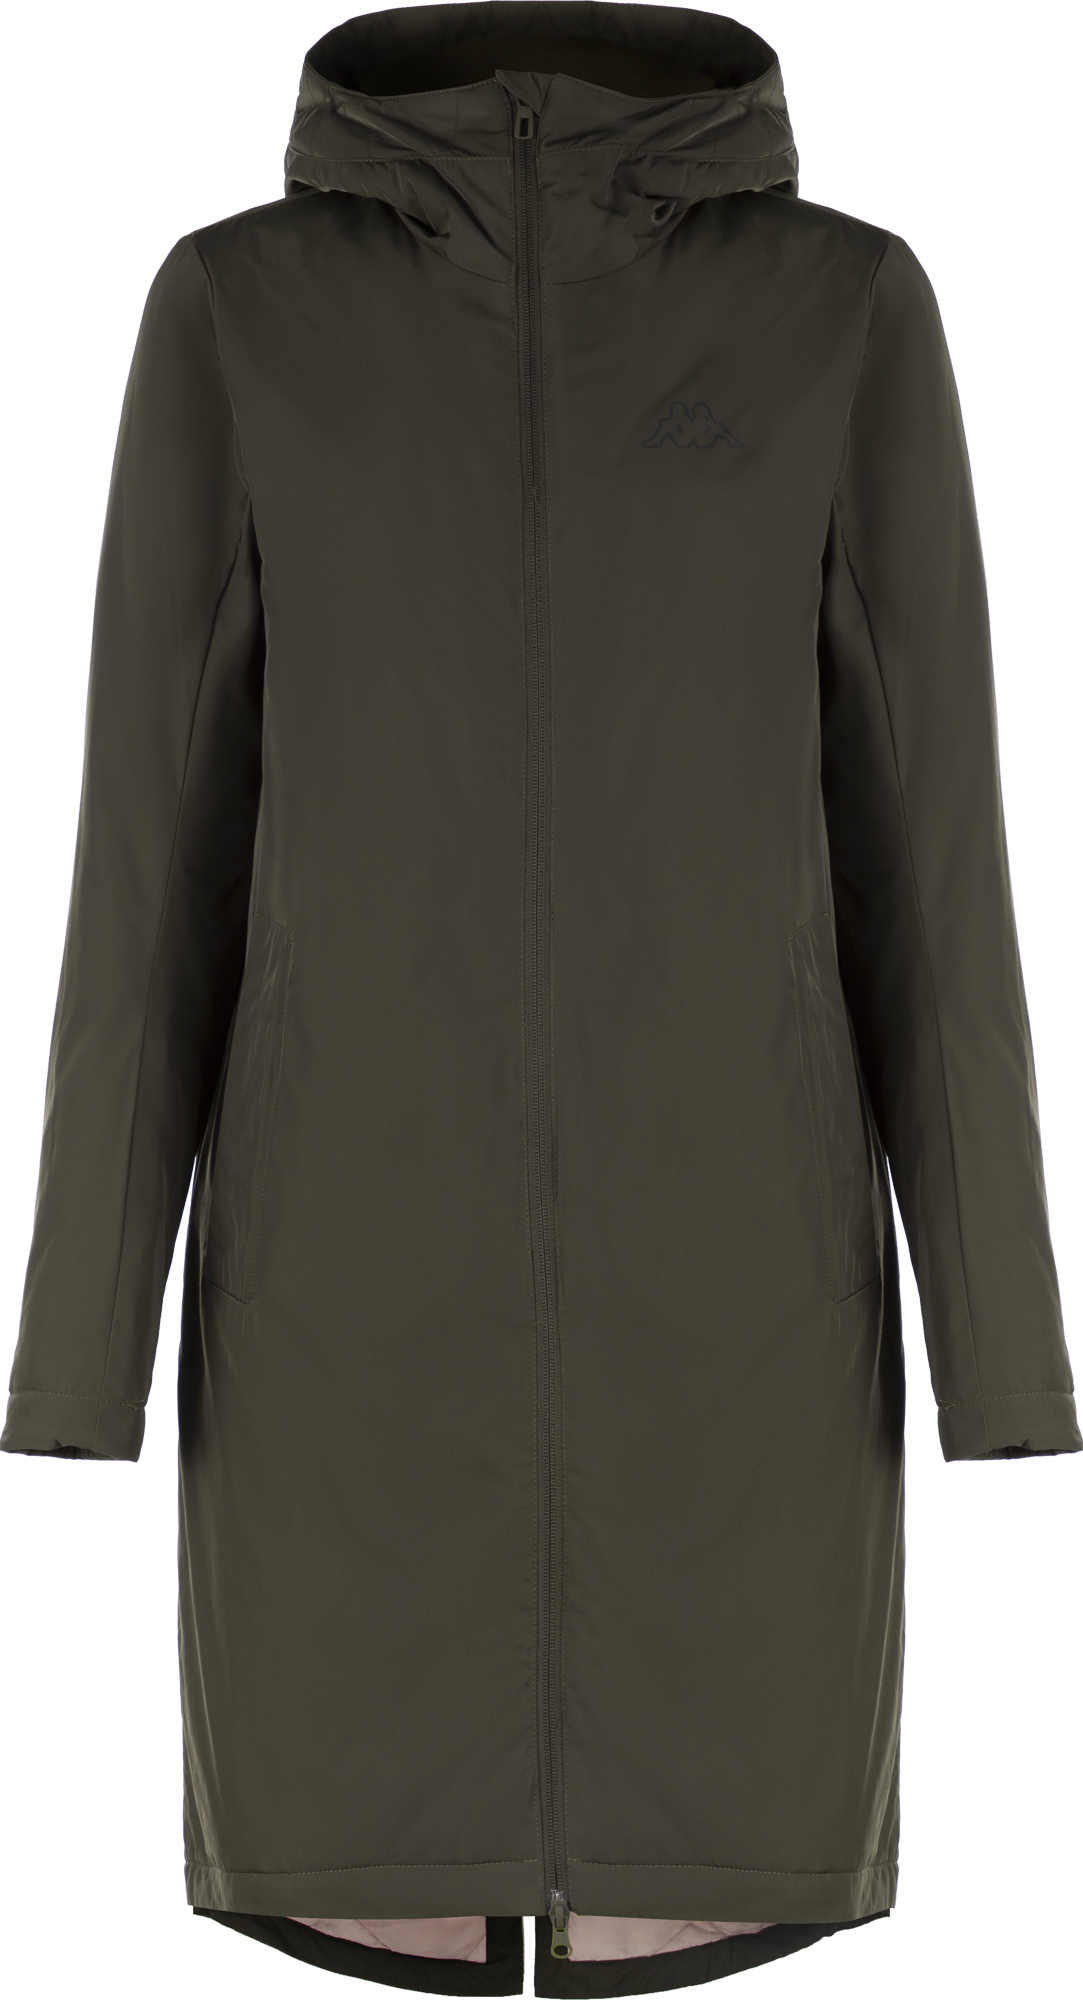 цена Kappa Куртка пуховая женская Kappa, размер 42 онлайн в 2017 году